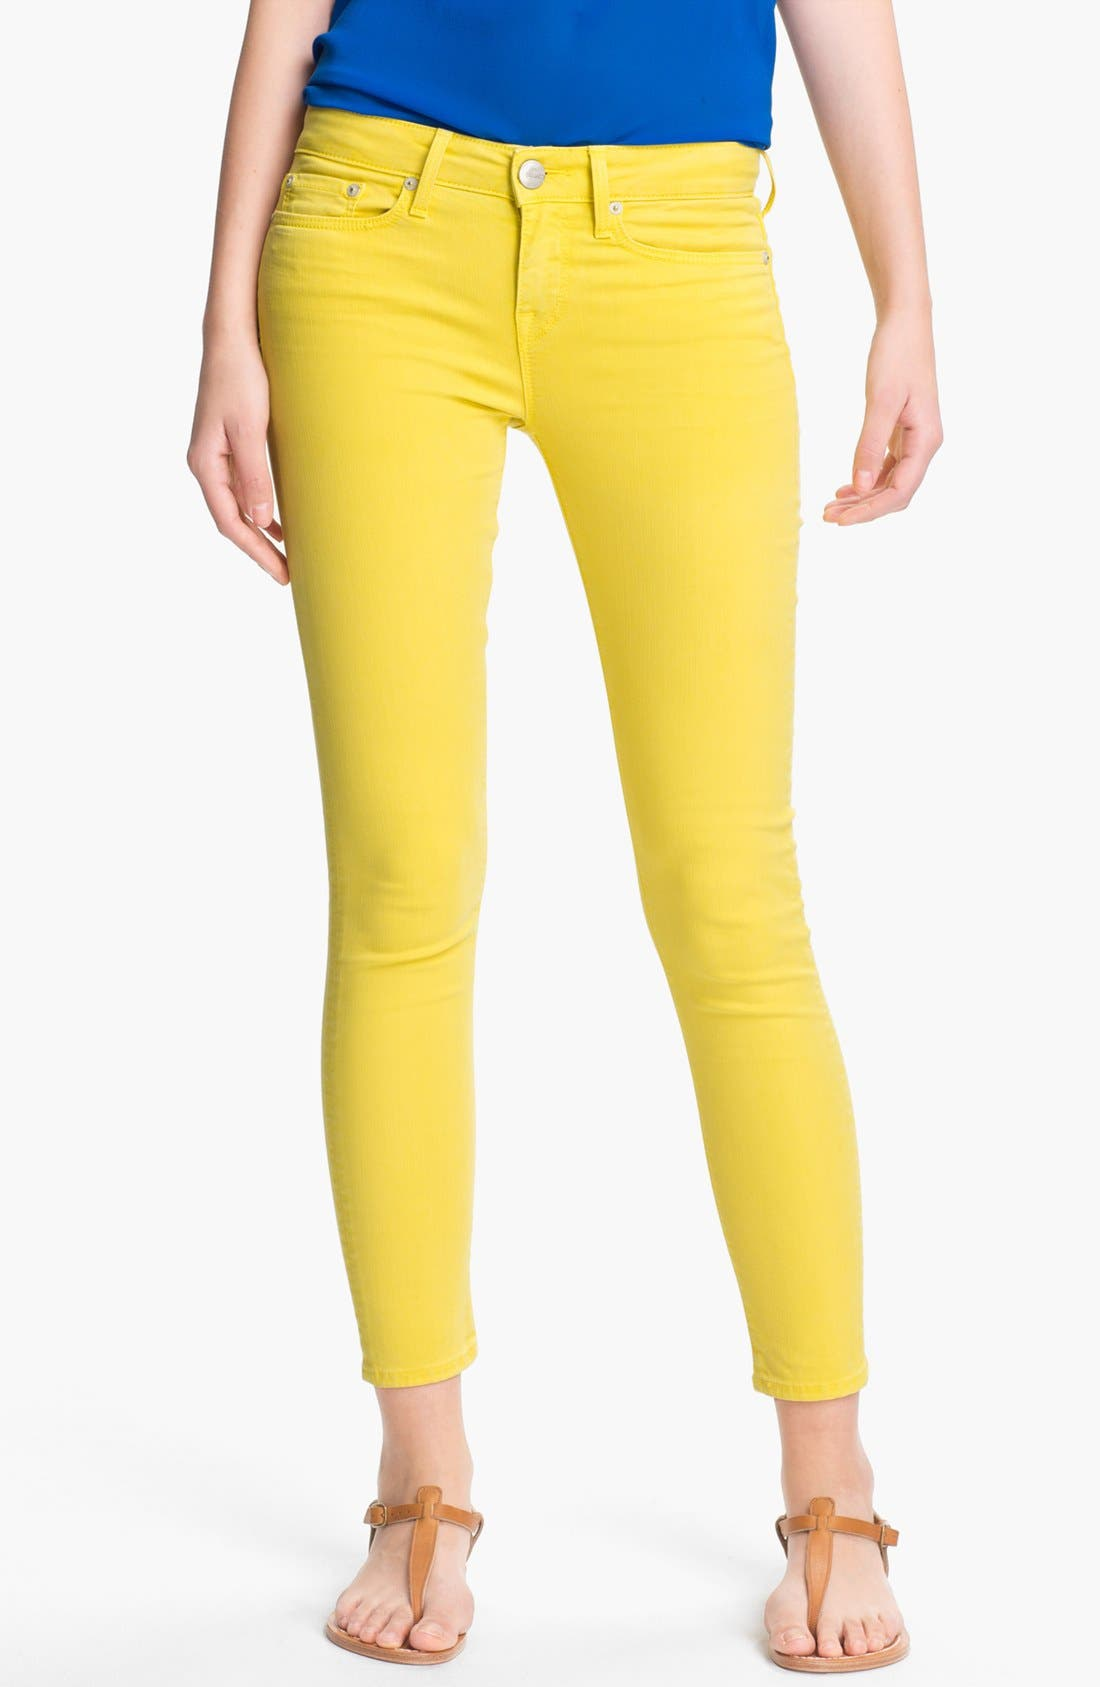 Alternate Image 1 Selected - Vince Crop Skinny Stretch Jeans (Citris)